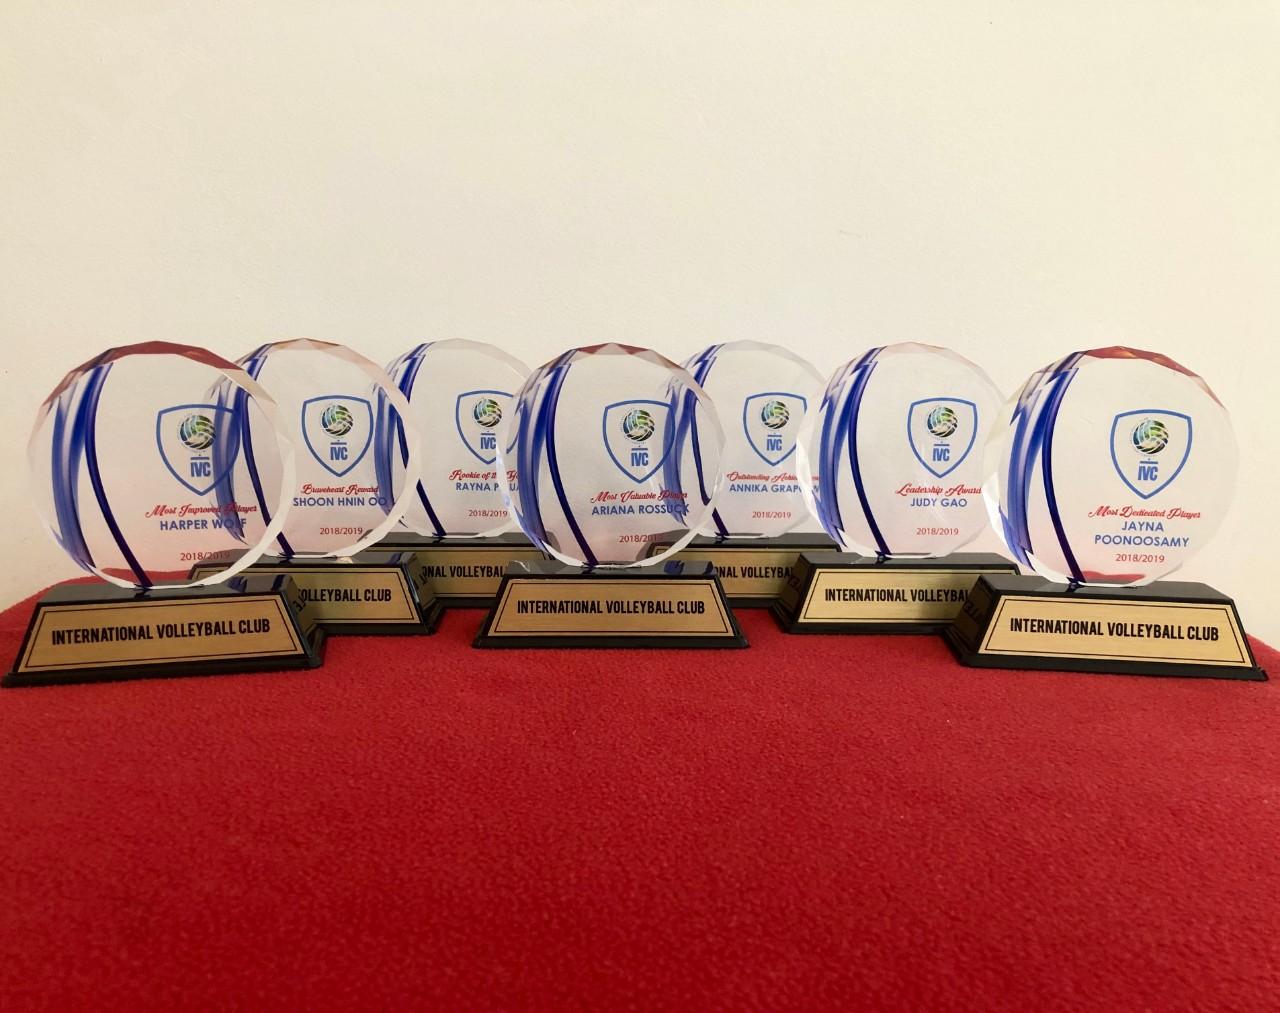 Ivc International Volleyball Club Singapore